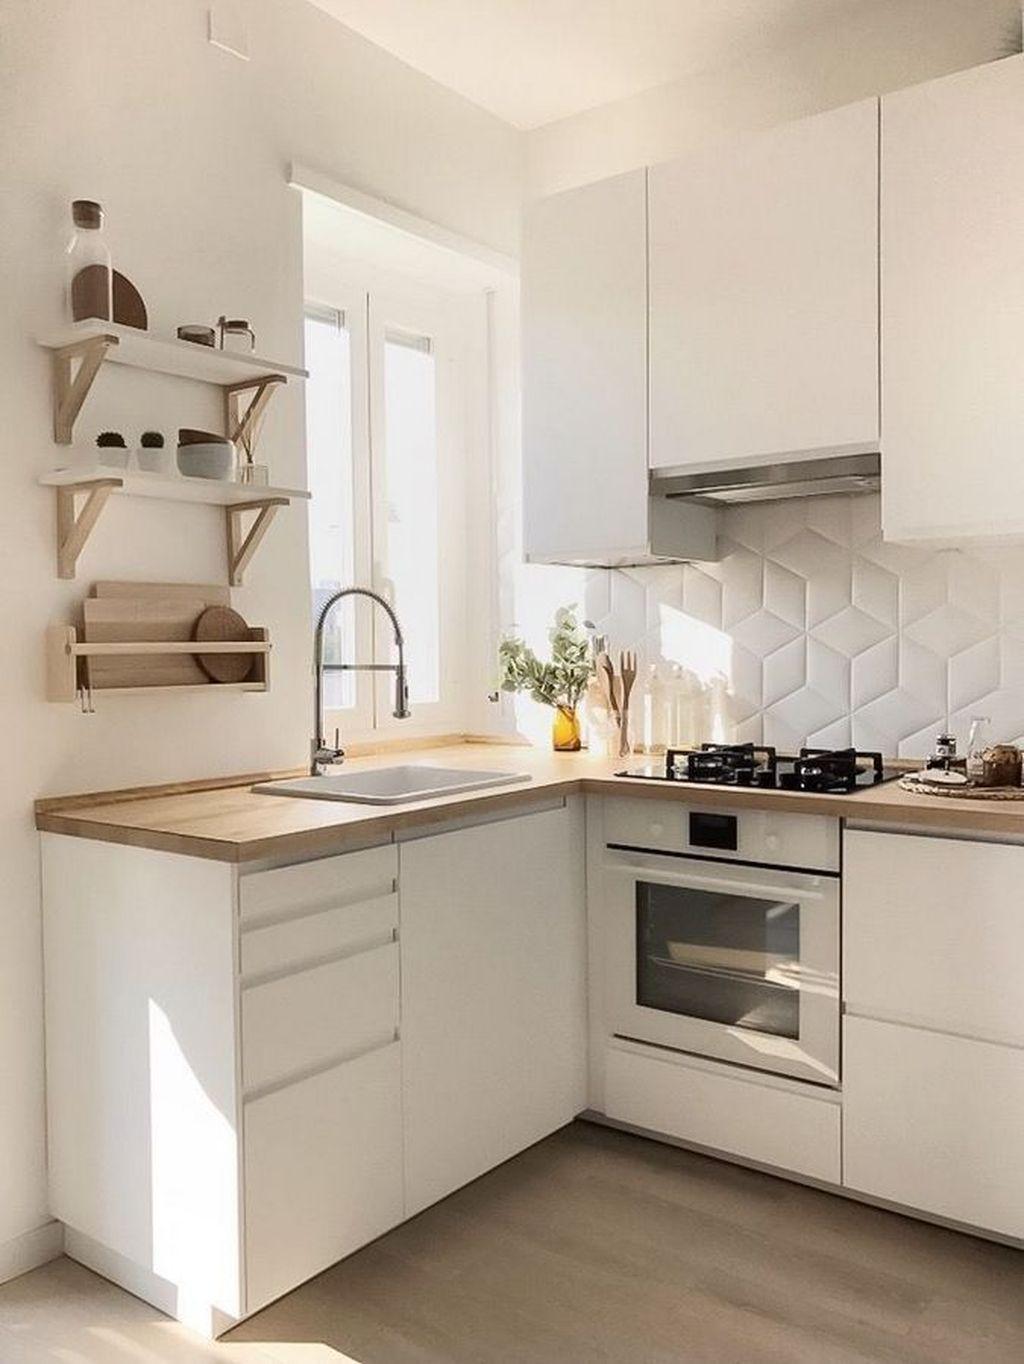 30 Totally Modern Kitchen Design Ideas Trenduhome Small Apartment Kitchen Ikea Kitchen Design Kitchen Design Small